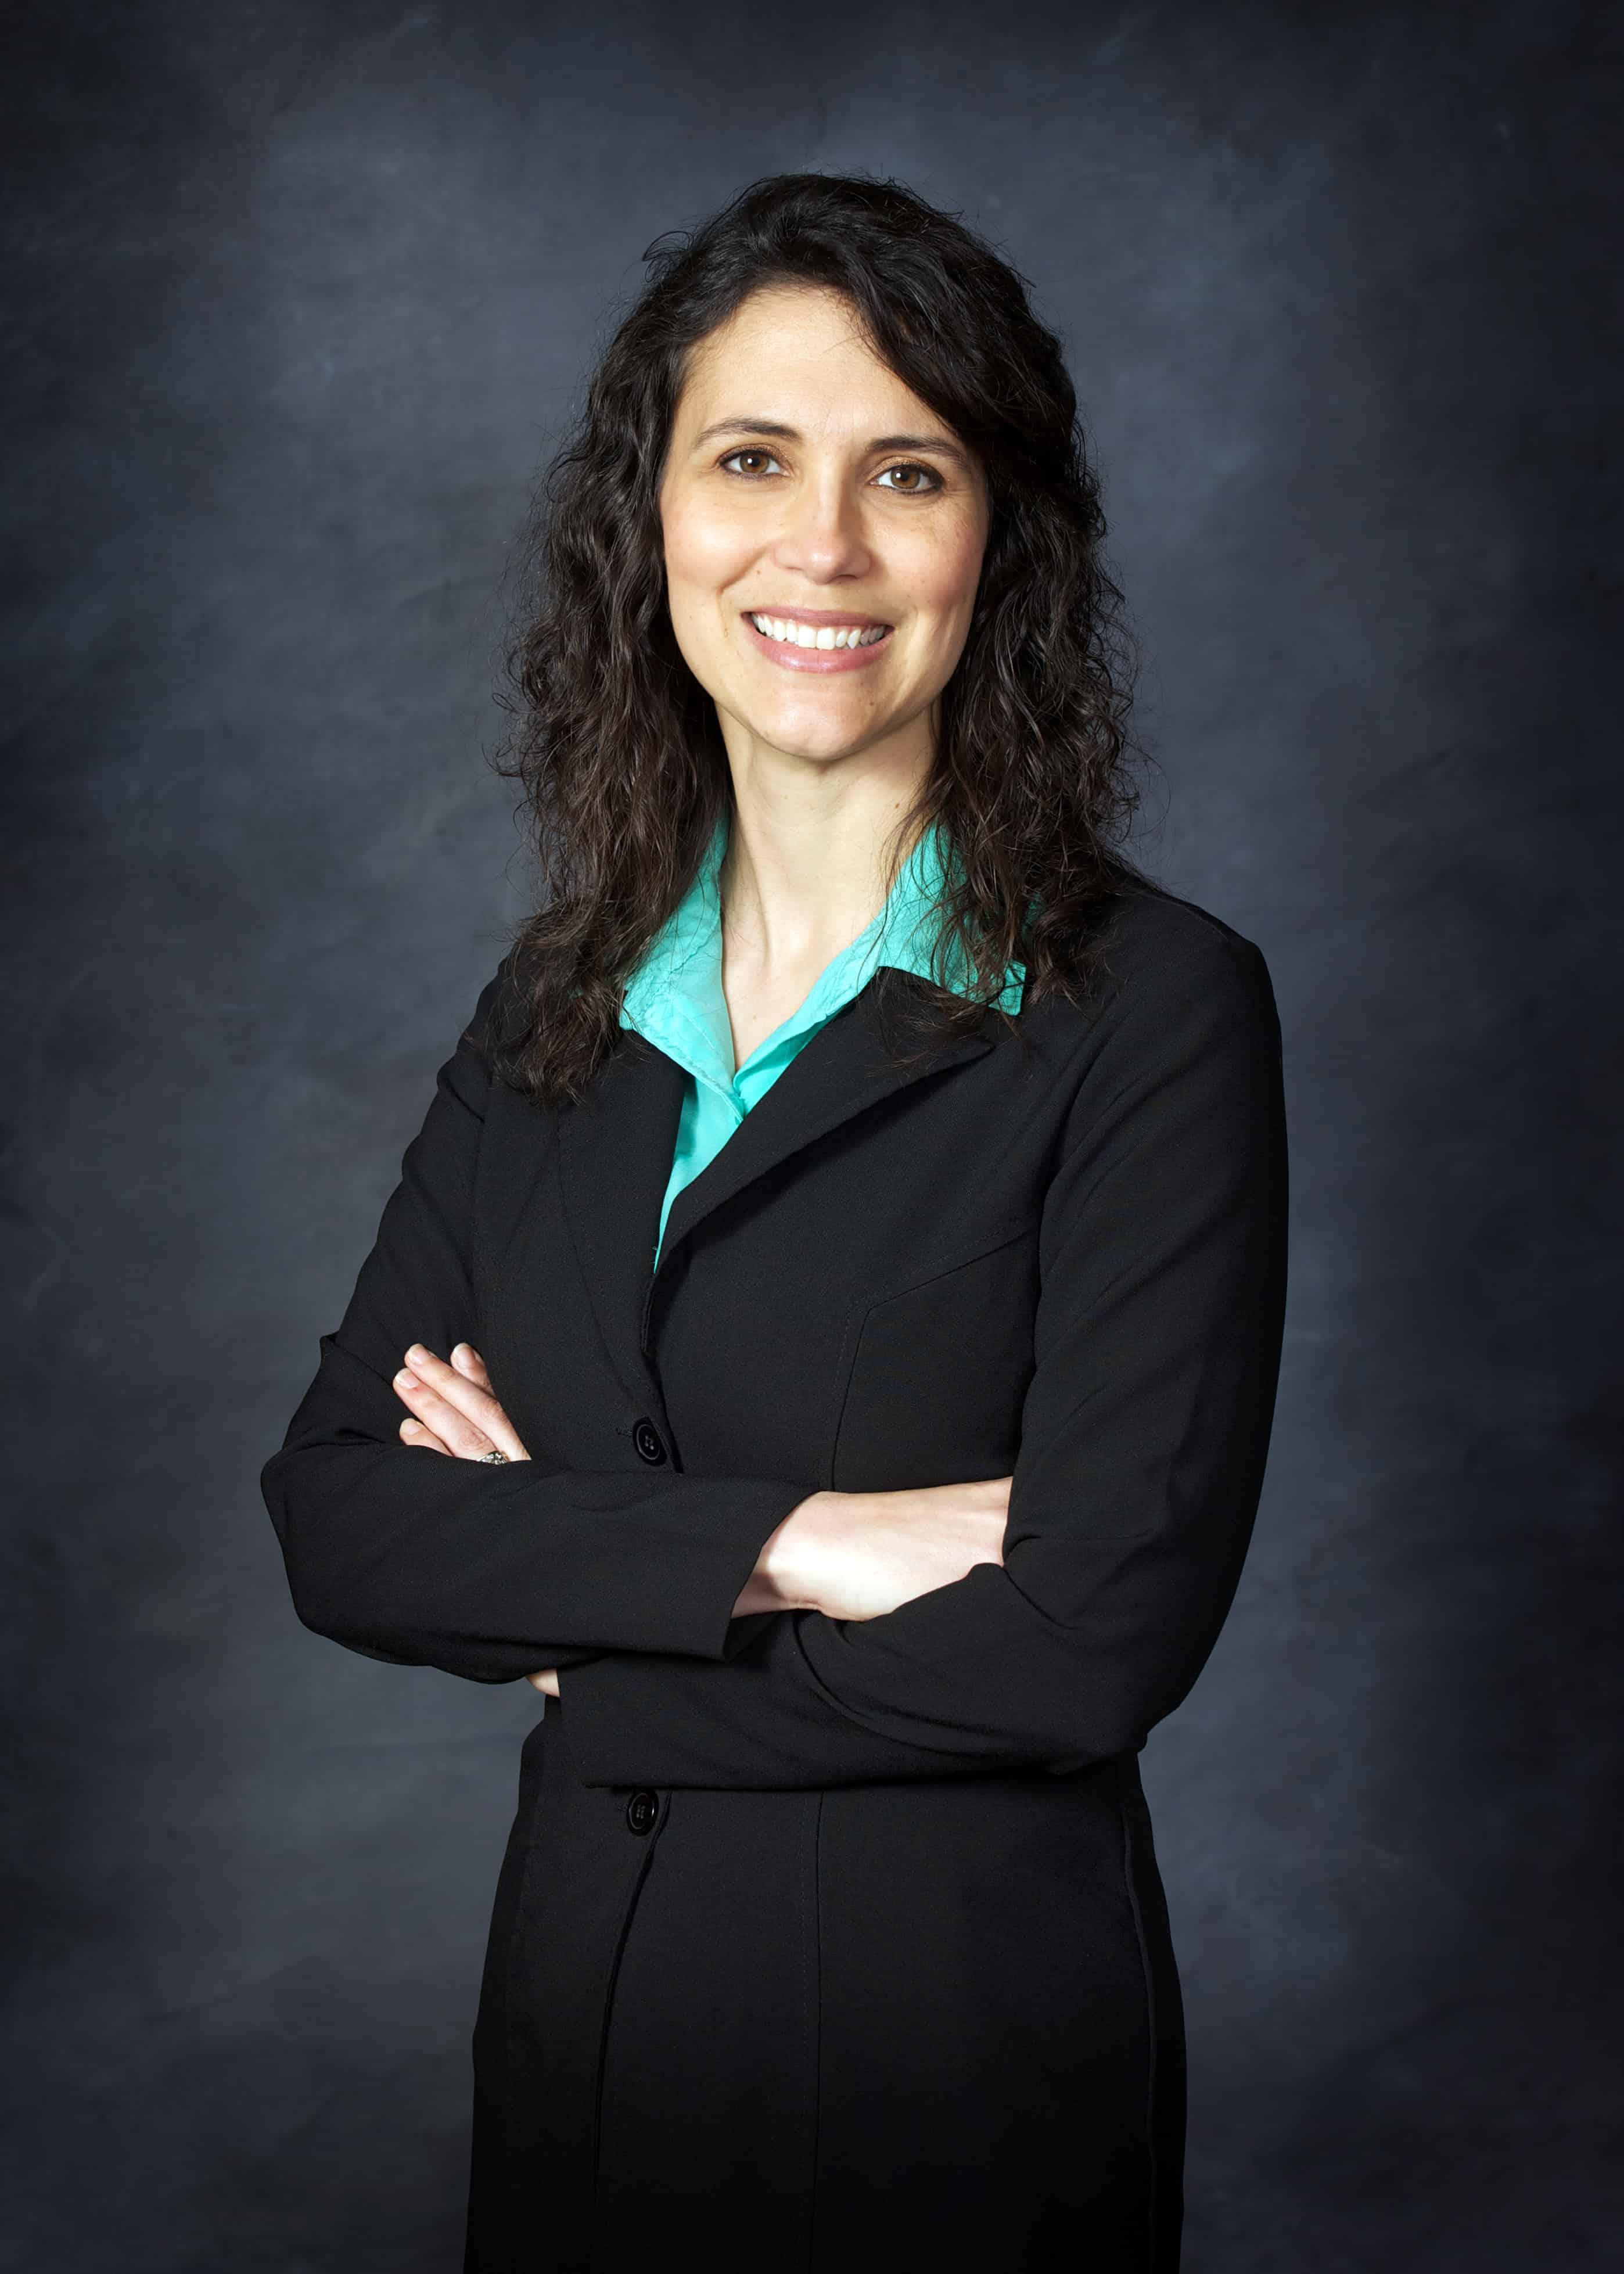 Headshot of Doctor Holly Goracke